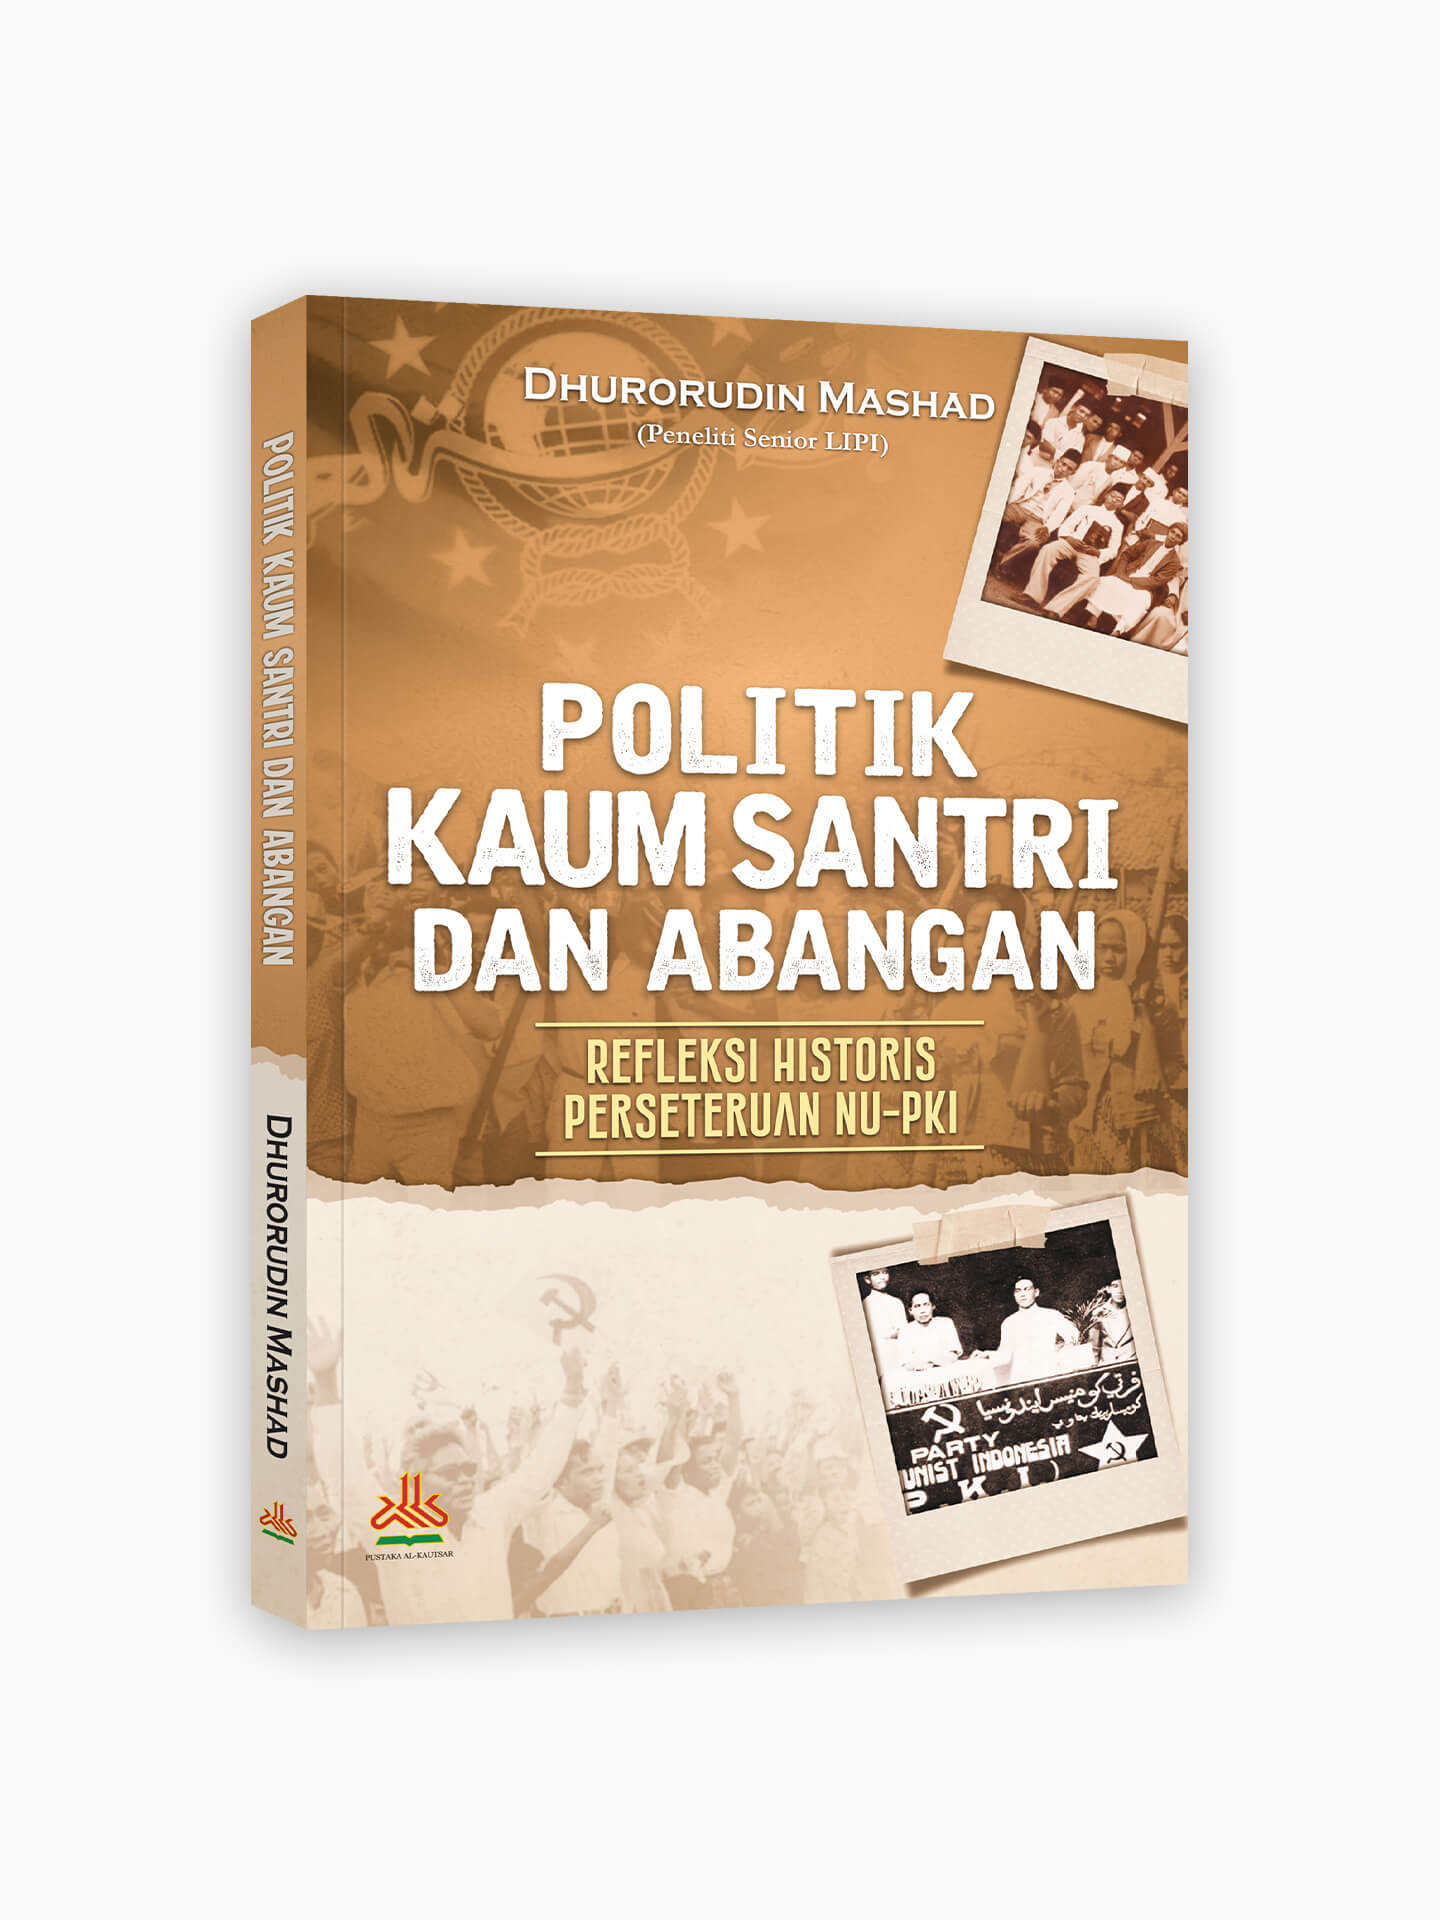 Politik Kaum Santri dan Abangan : Refleksi Historis Perseteruan NU-PKI